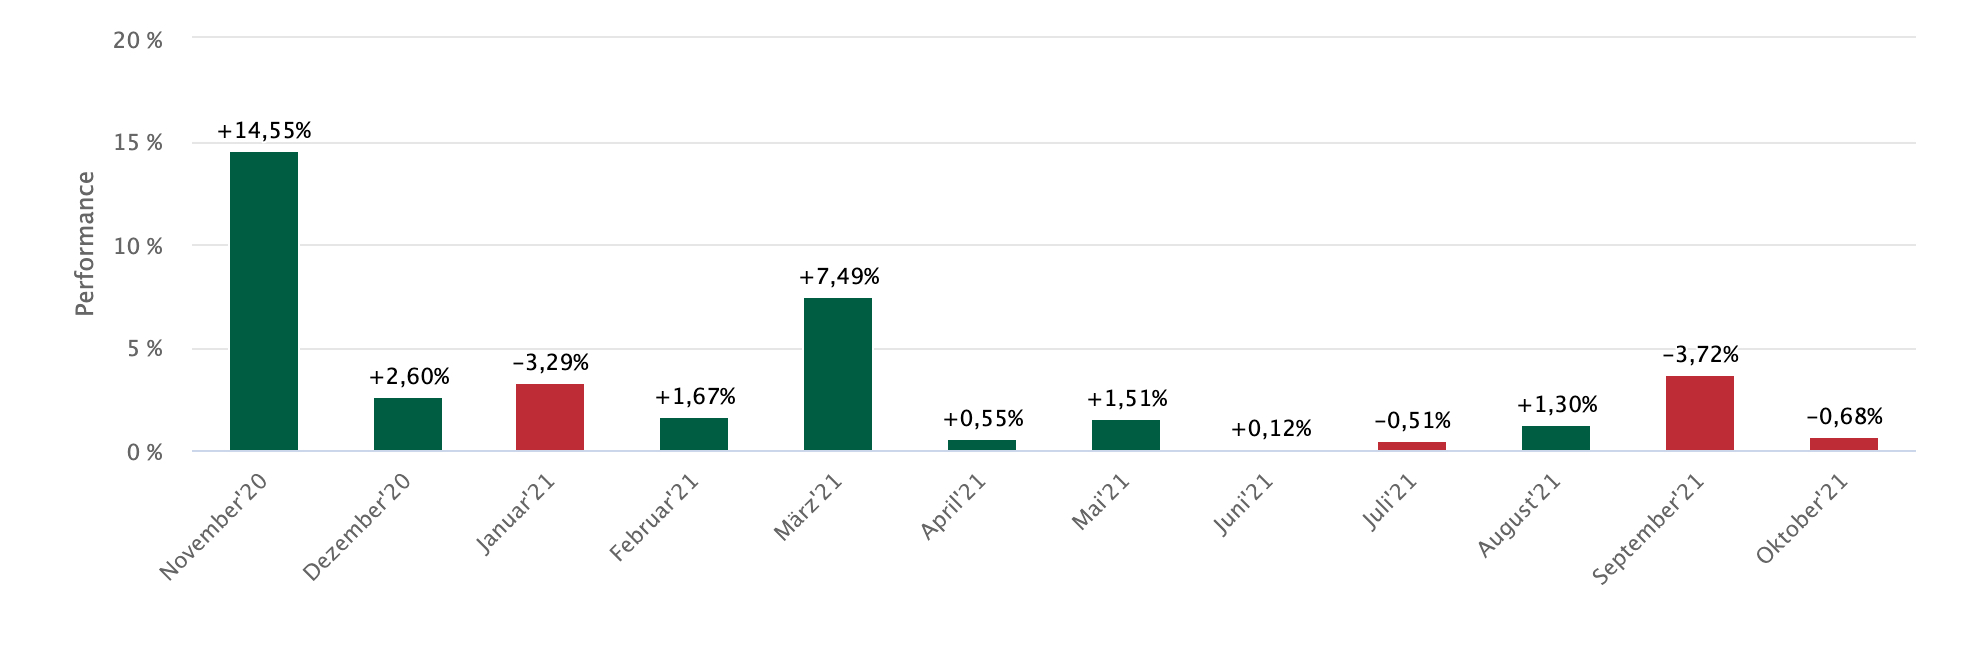 DAX-Monatsstatistik zum Oktober 2021